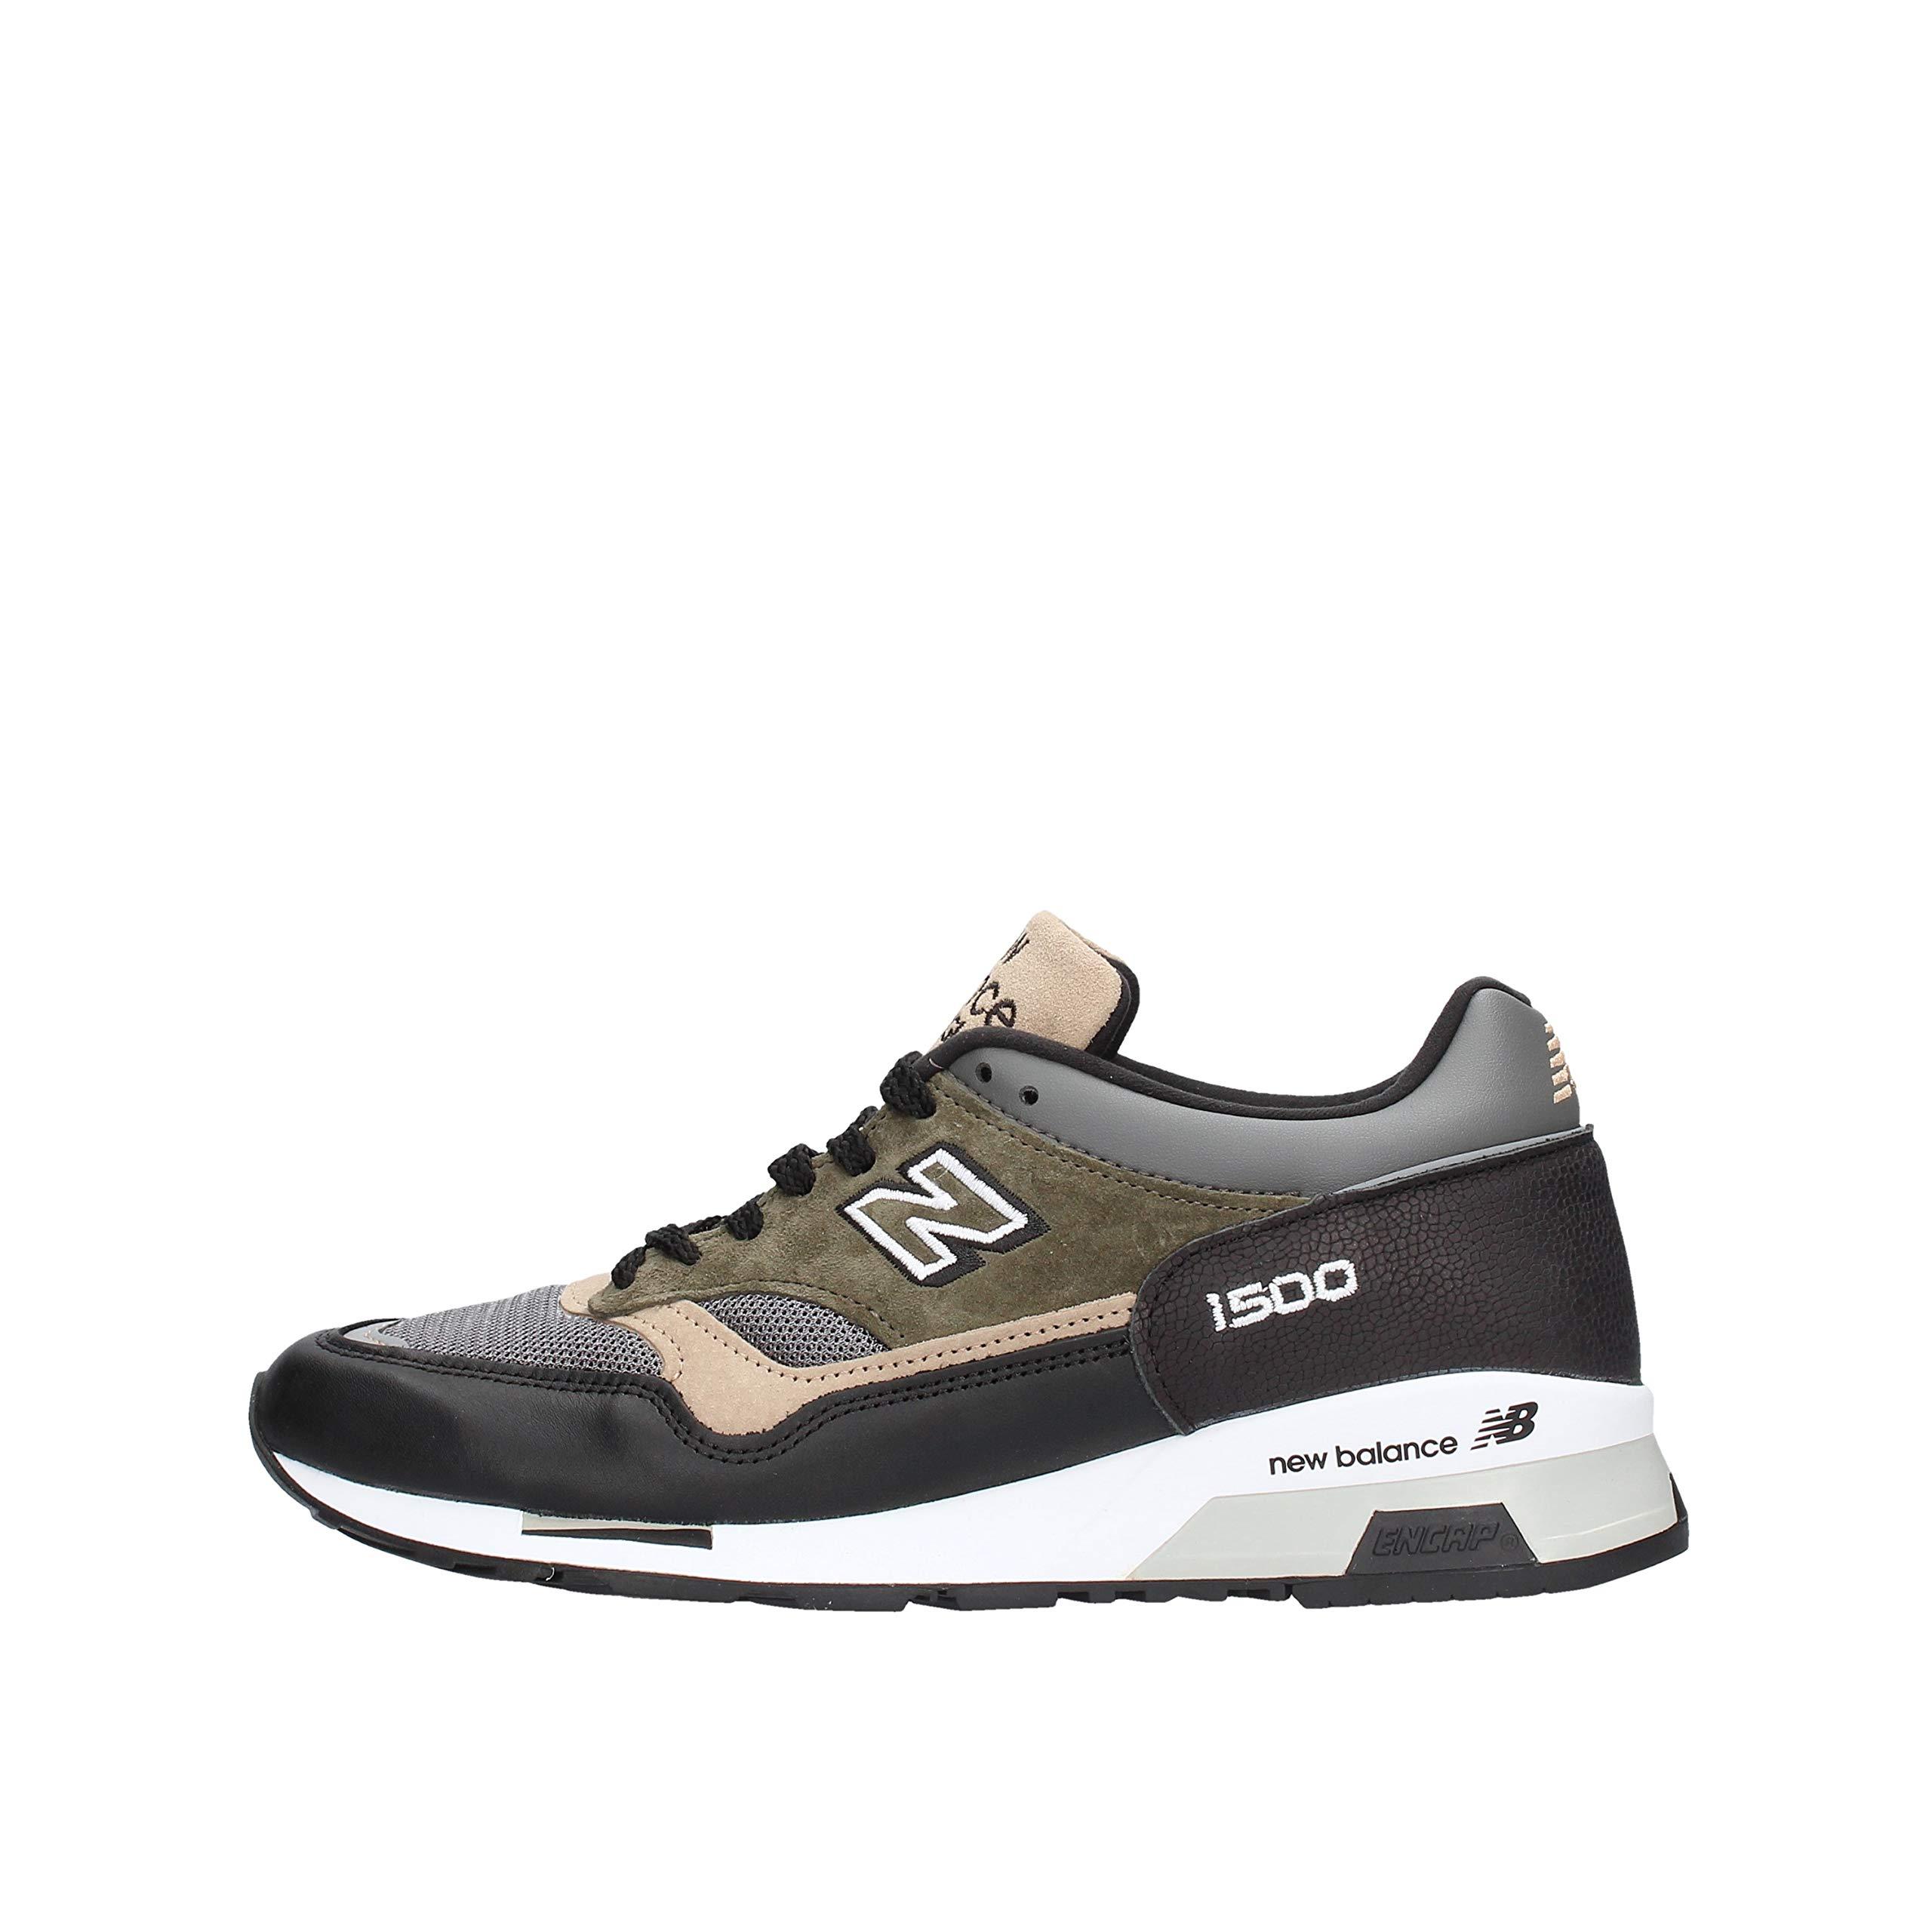 New Balance 1500 Fds Sneaker Men Black